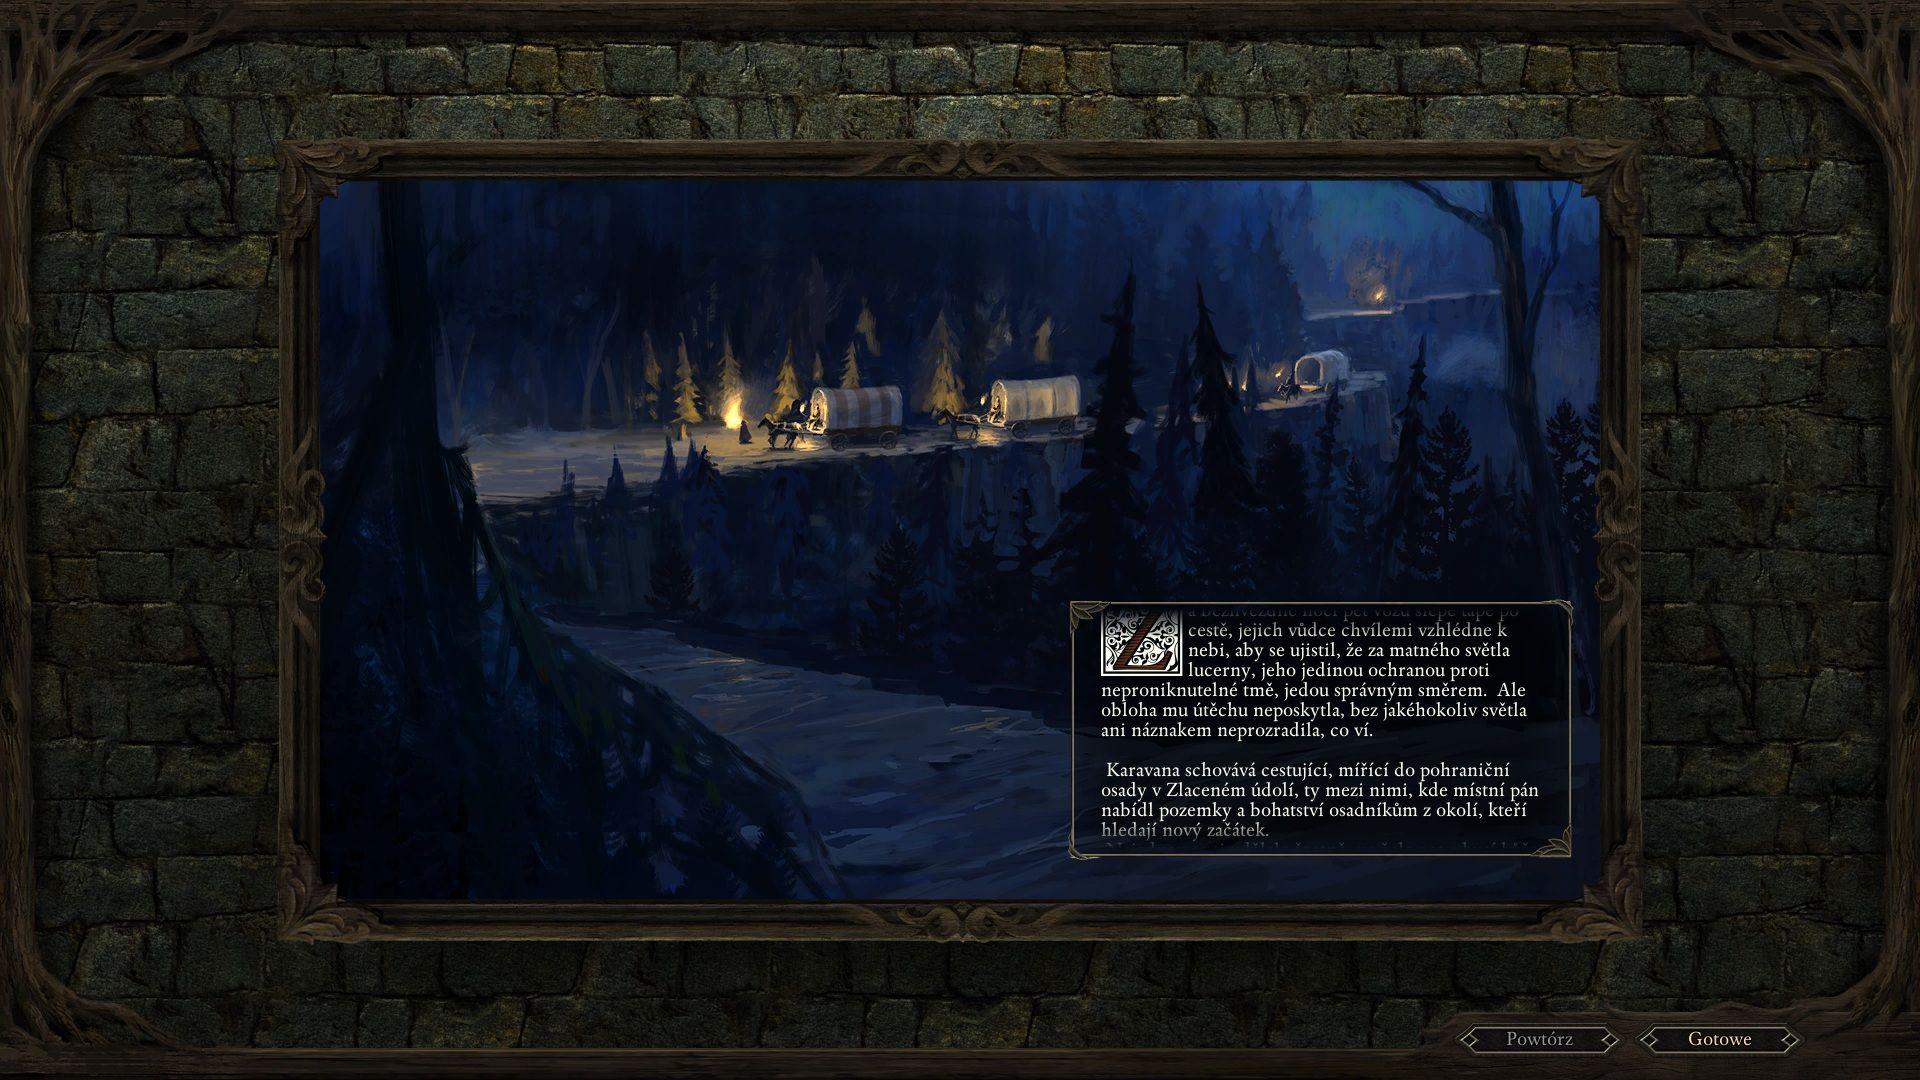 RPG hry Divinity: Original Sin a Pillars of Eternity v češtině 123365